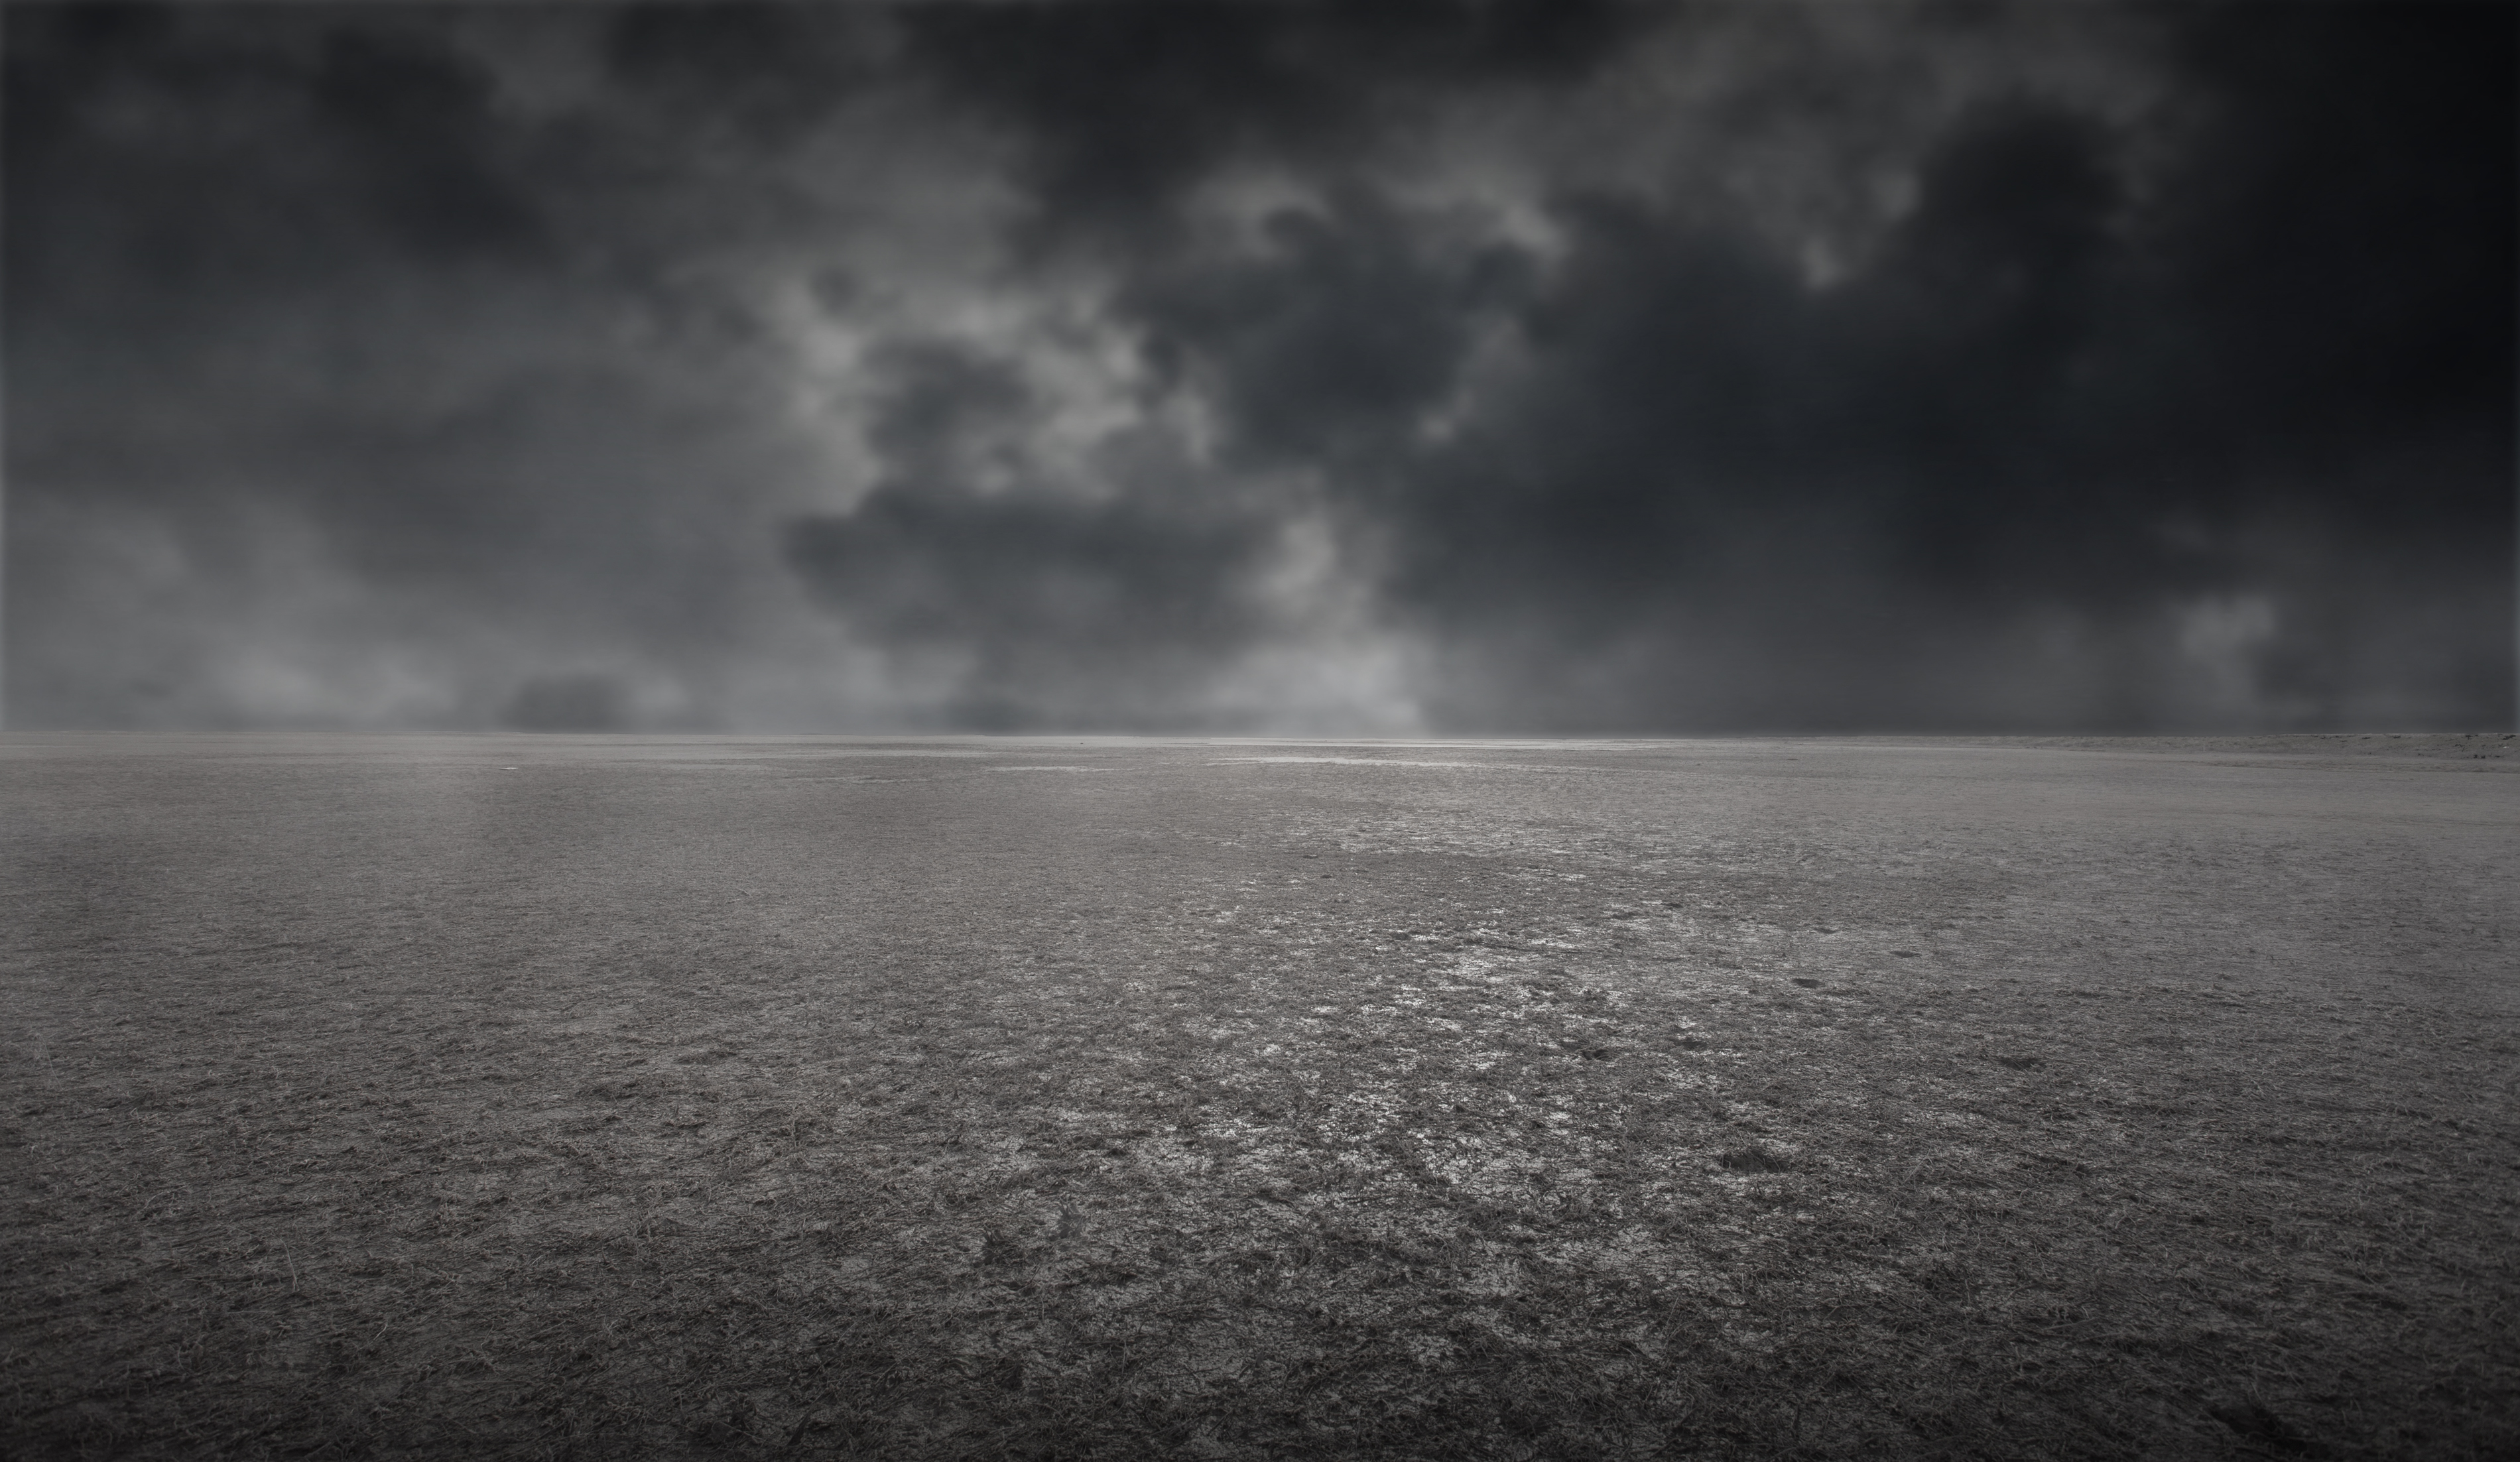 dark empty background (stock)